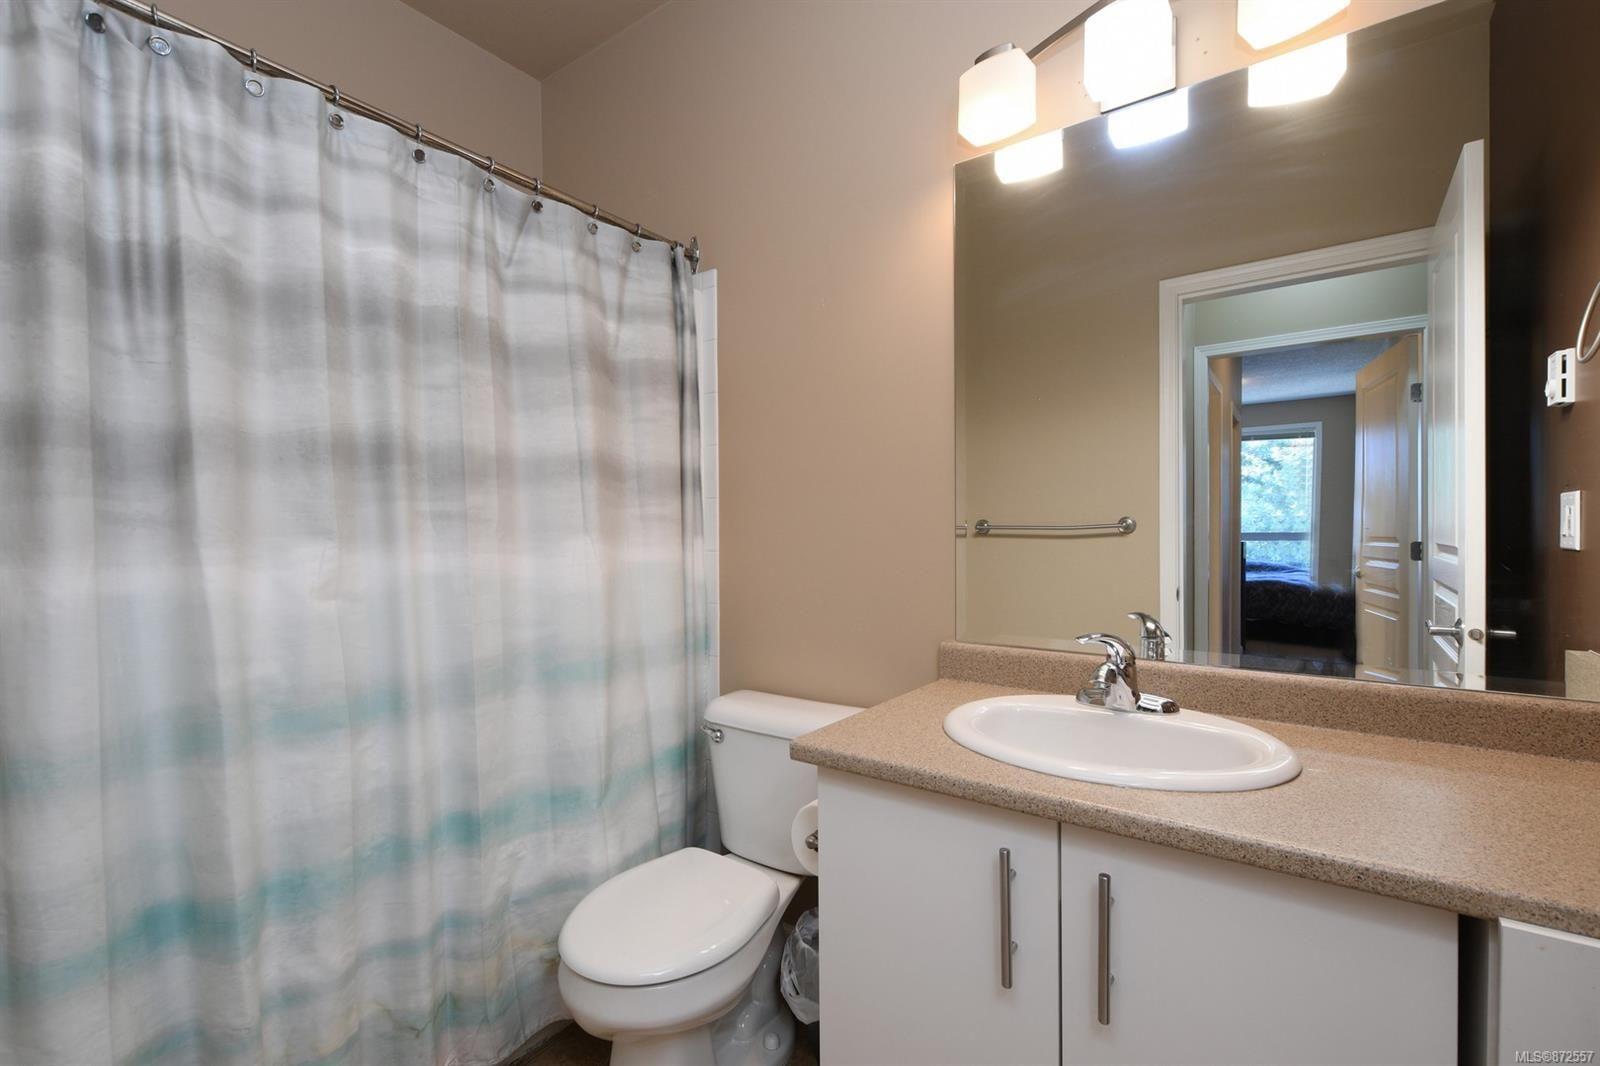 Photo 15: Photos: 411 825 Goldstream Ave in : La Langford Proper Condo for sale (Langford)  : MLS®# 872557